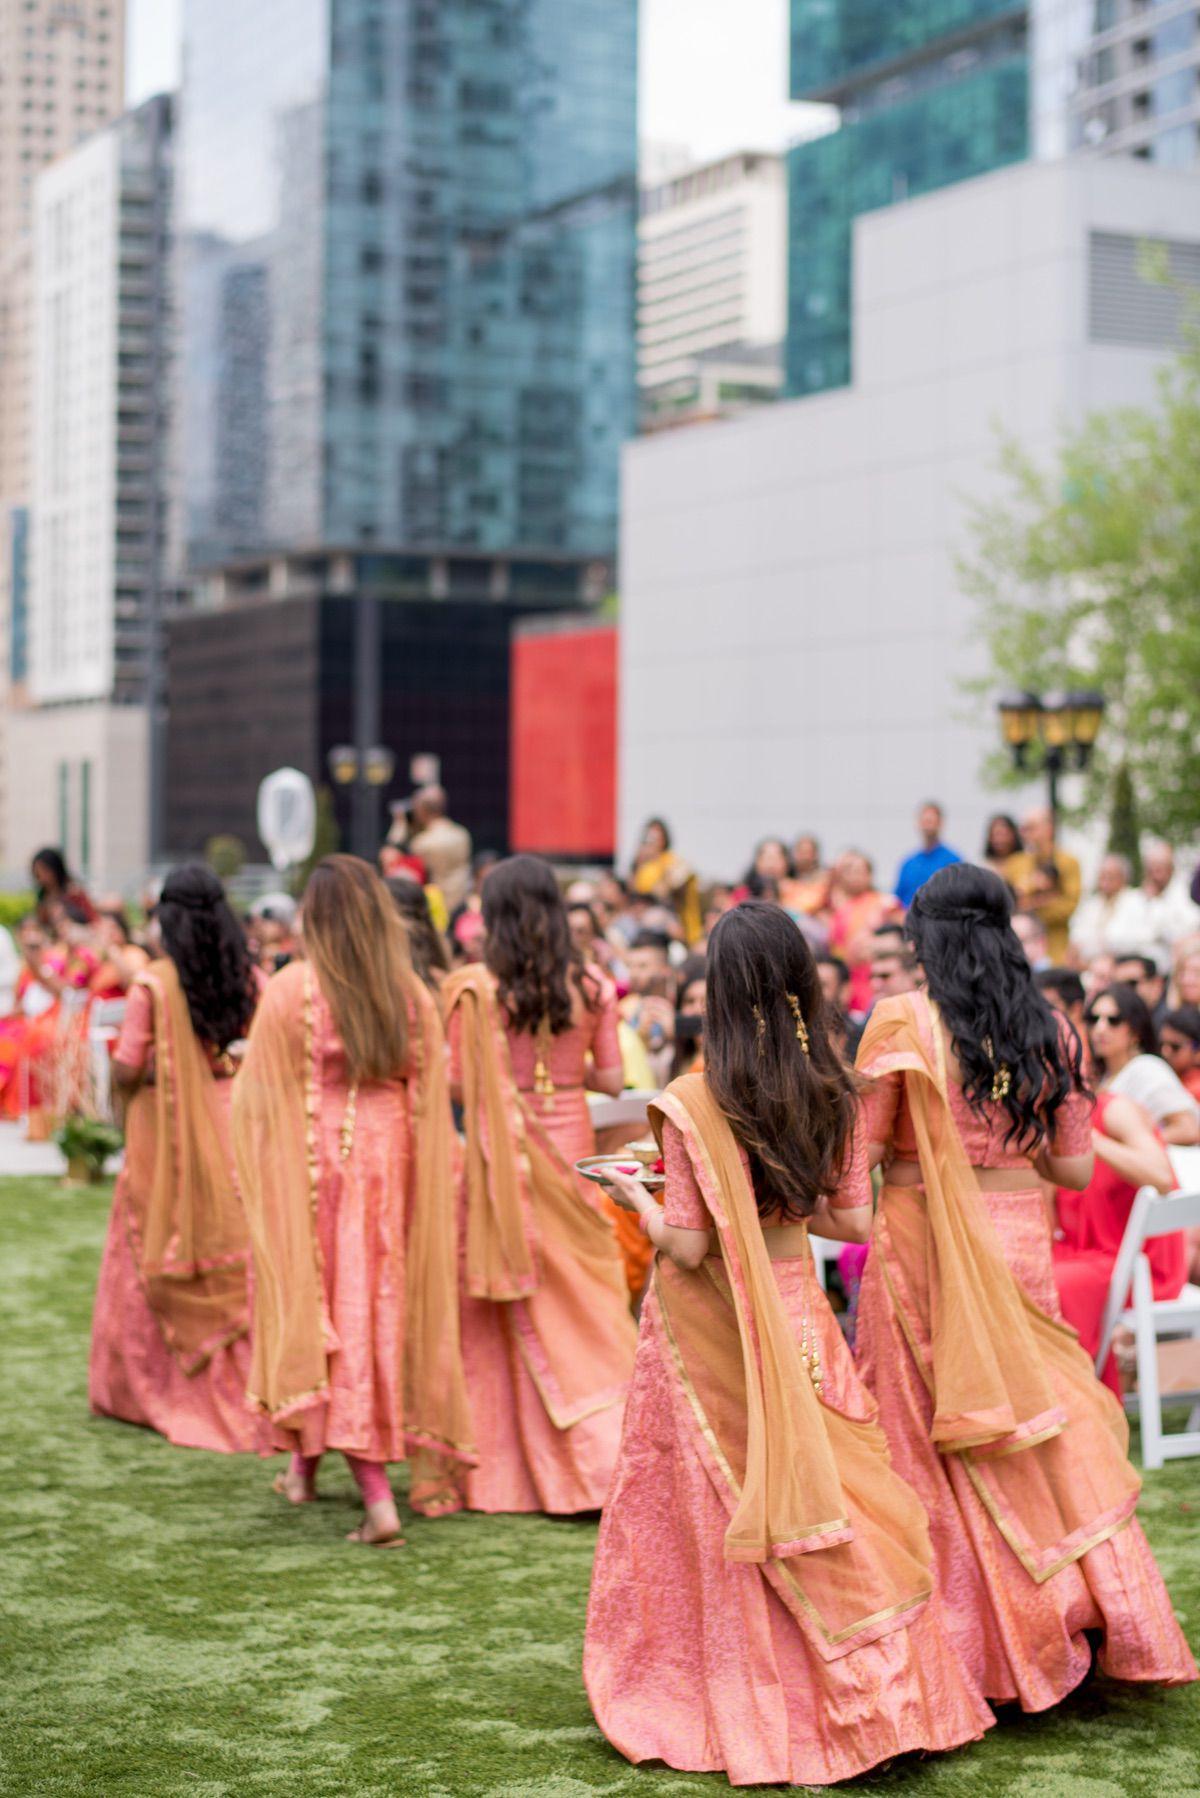 Le_Cape_Weddings_-_Serena_-_Chicago_South_Asian_Wedding_-_Ceremony_--28.jpg